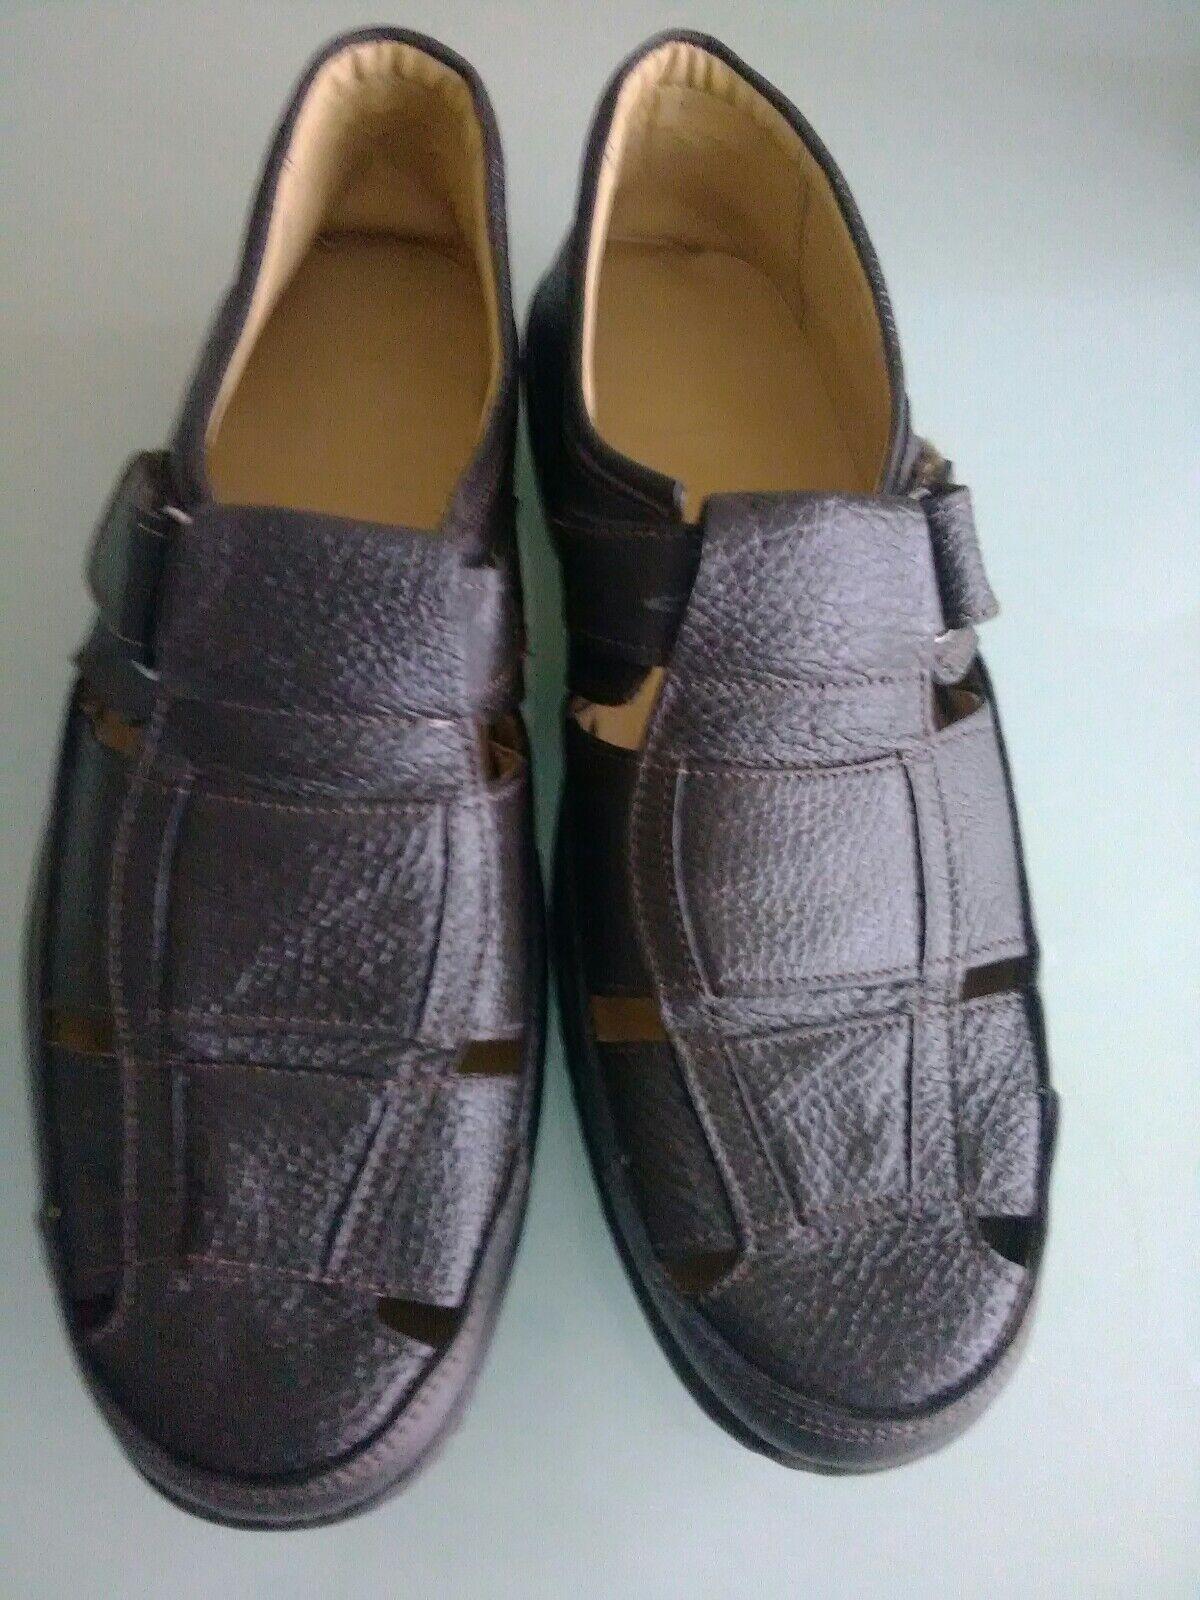 Men's Brown Leather Sandal/ Shoes, Size 8